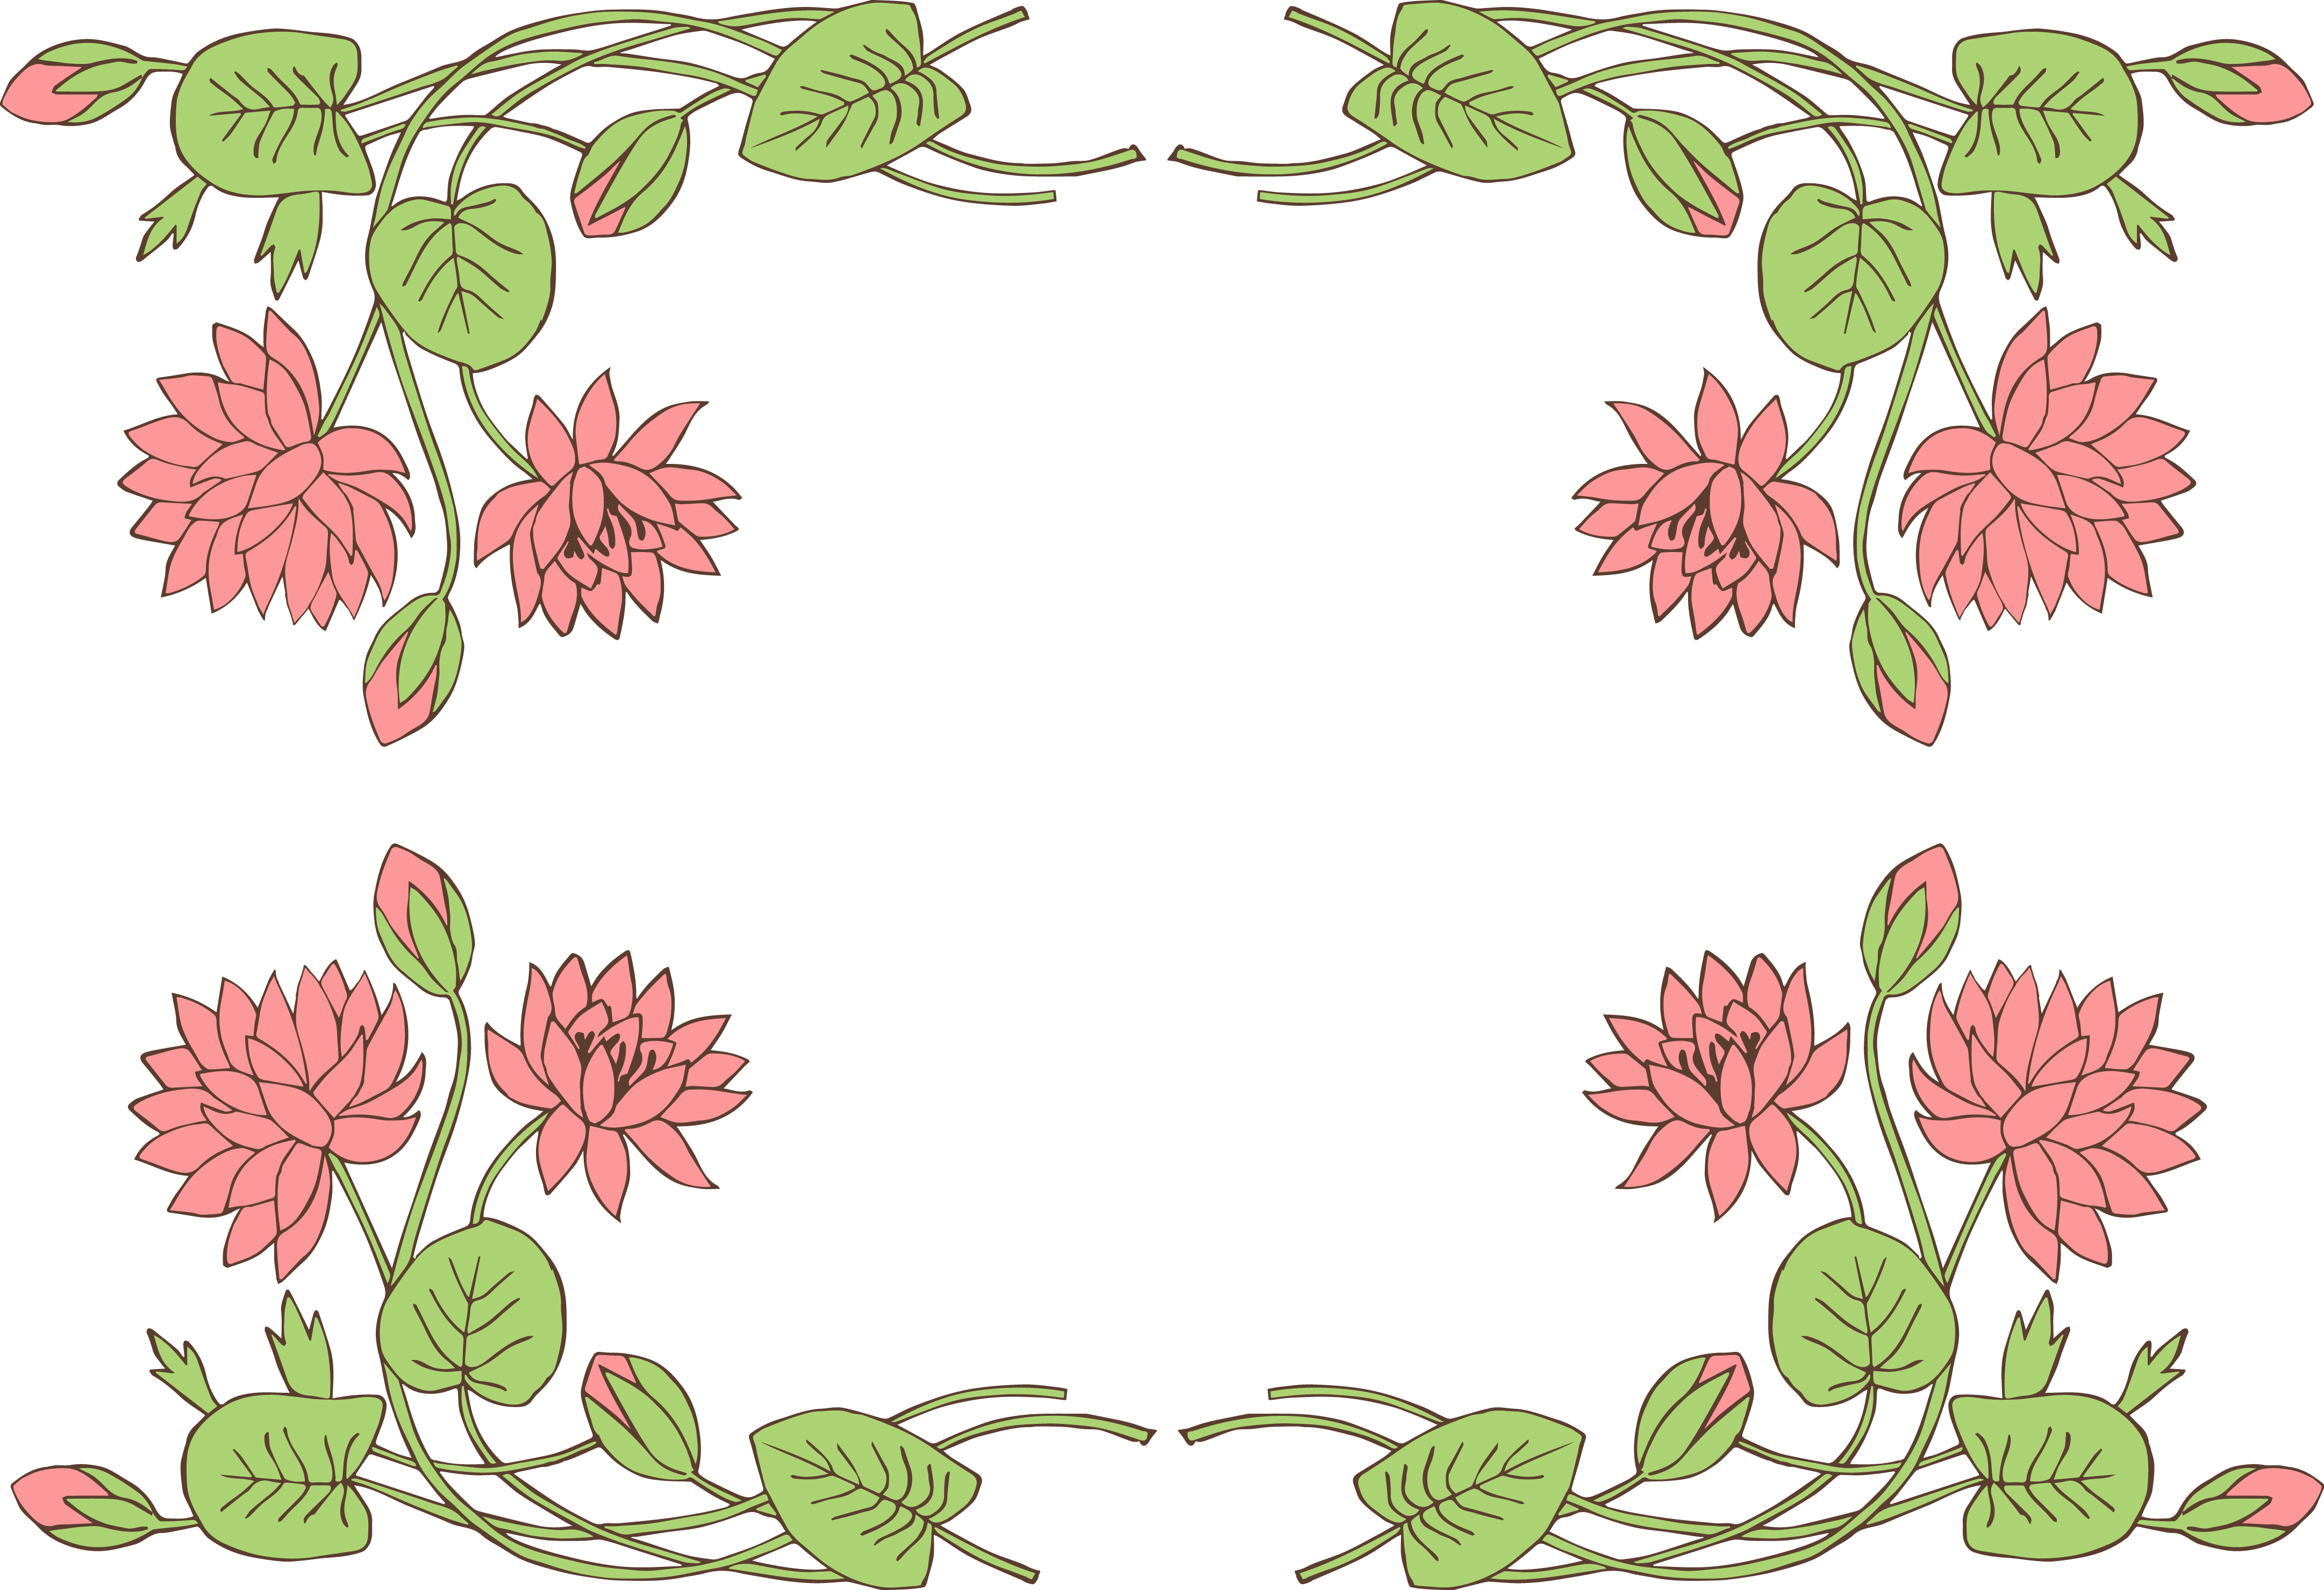 Lily Pad Lotus Flower BorderClip Art Image.